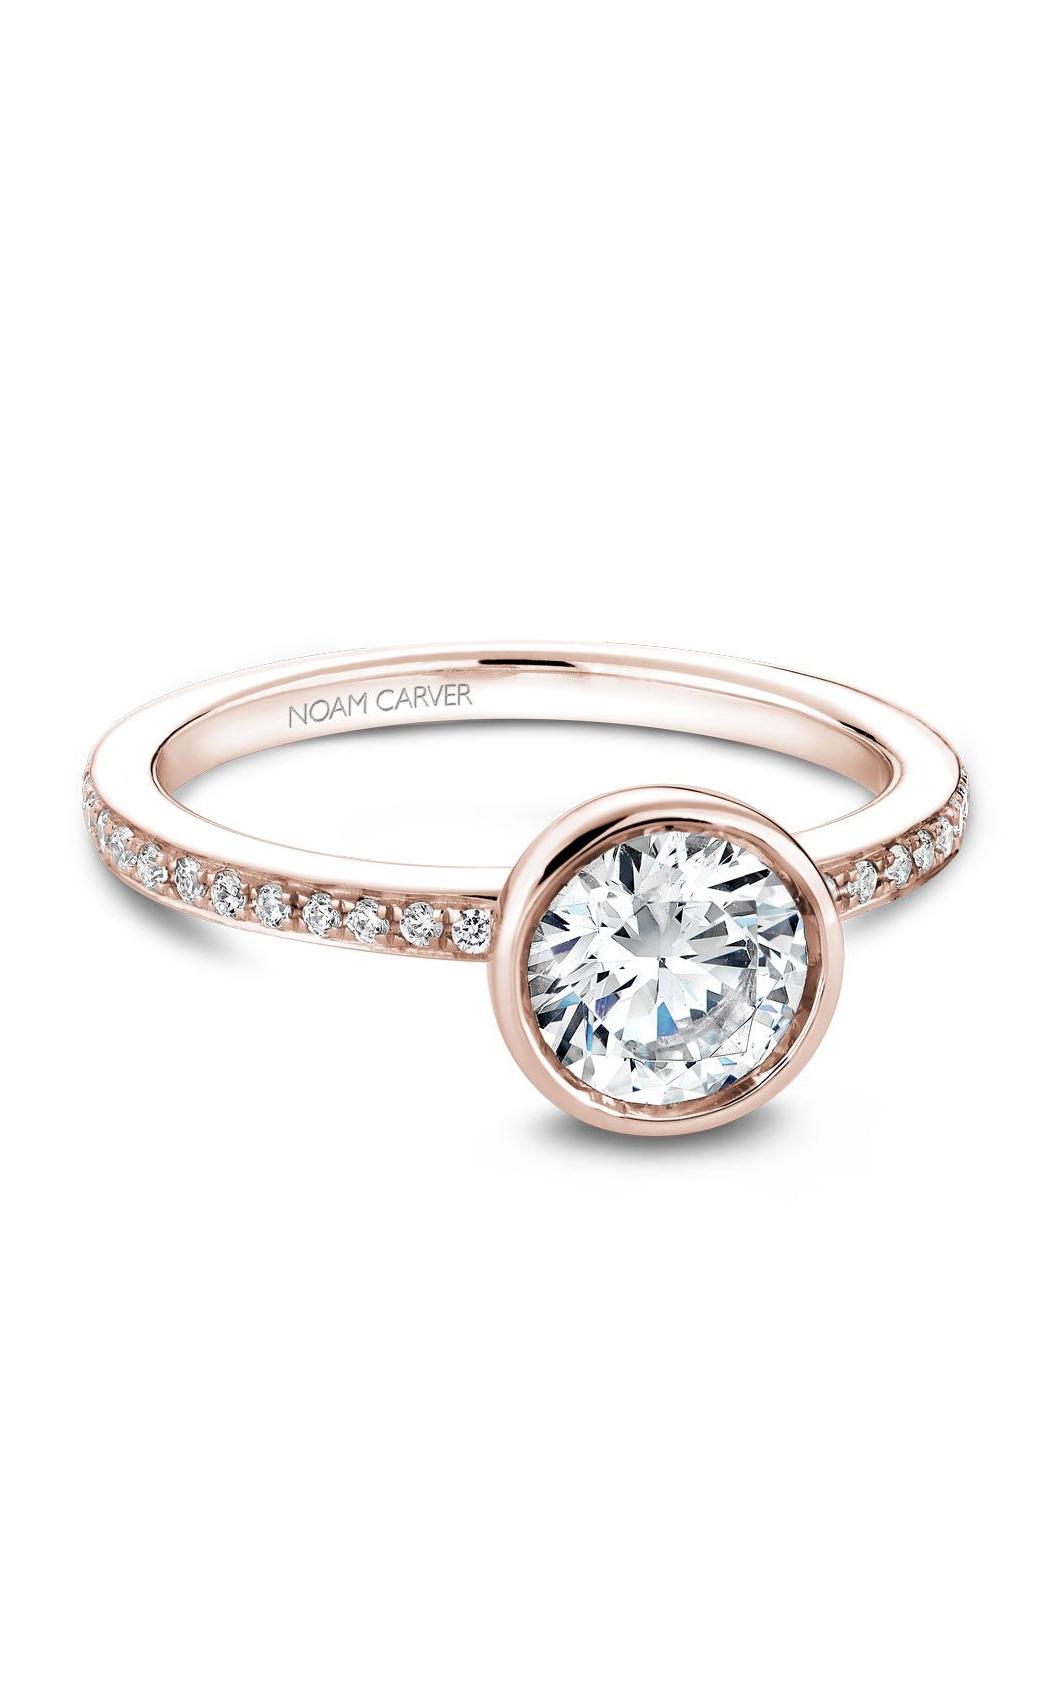 Noam Carver Modern Engagement Ring B095-02RA product image